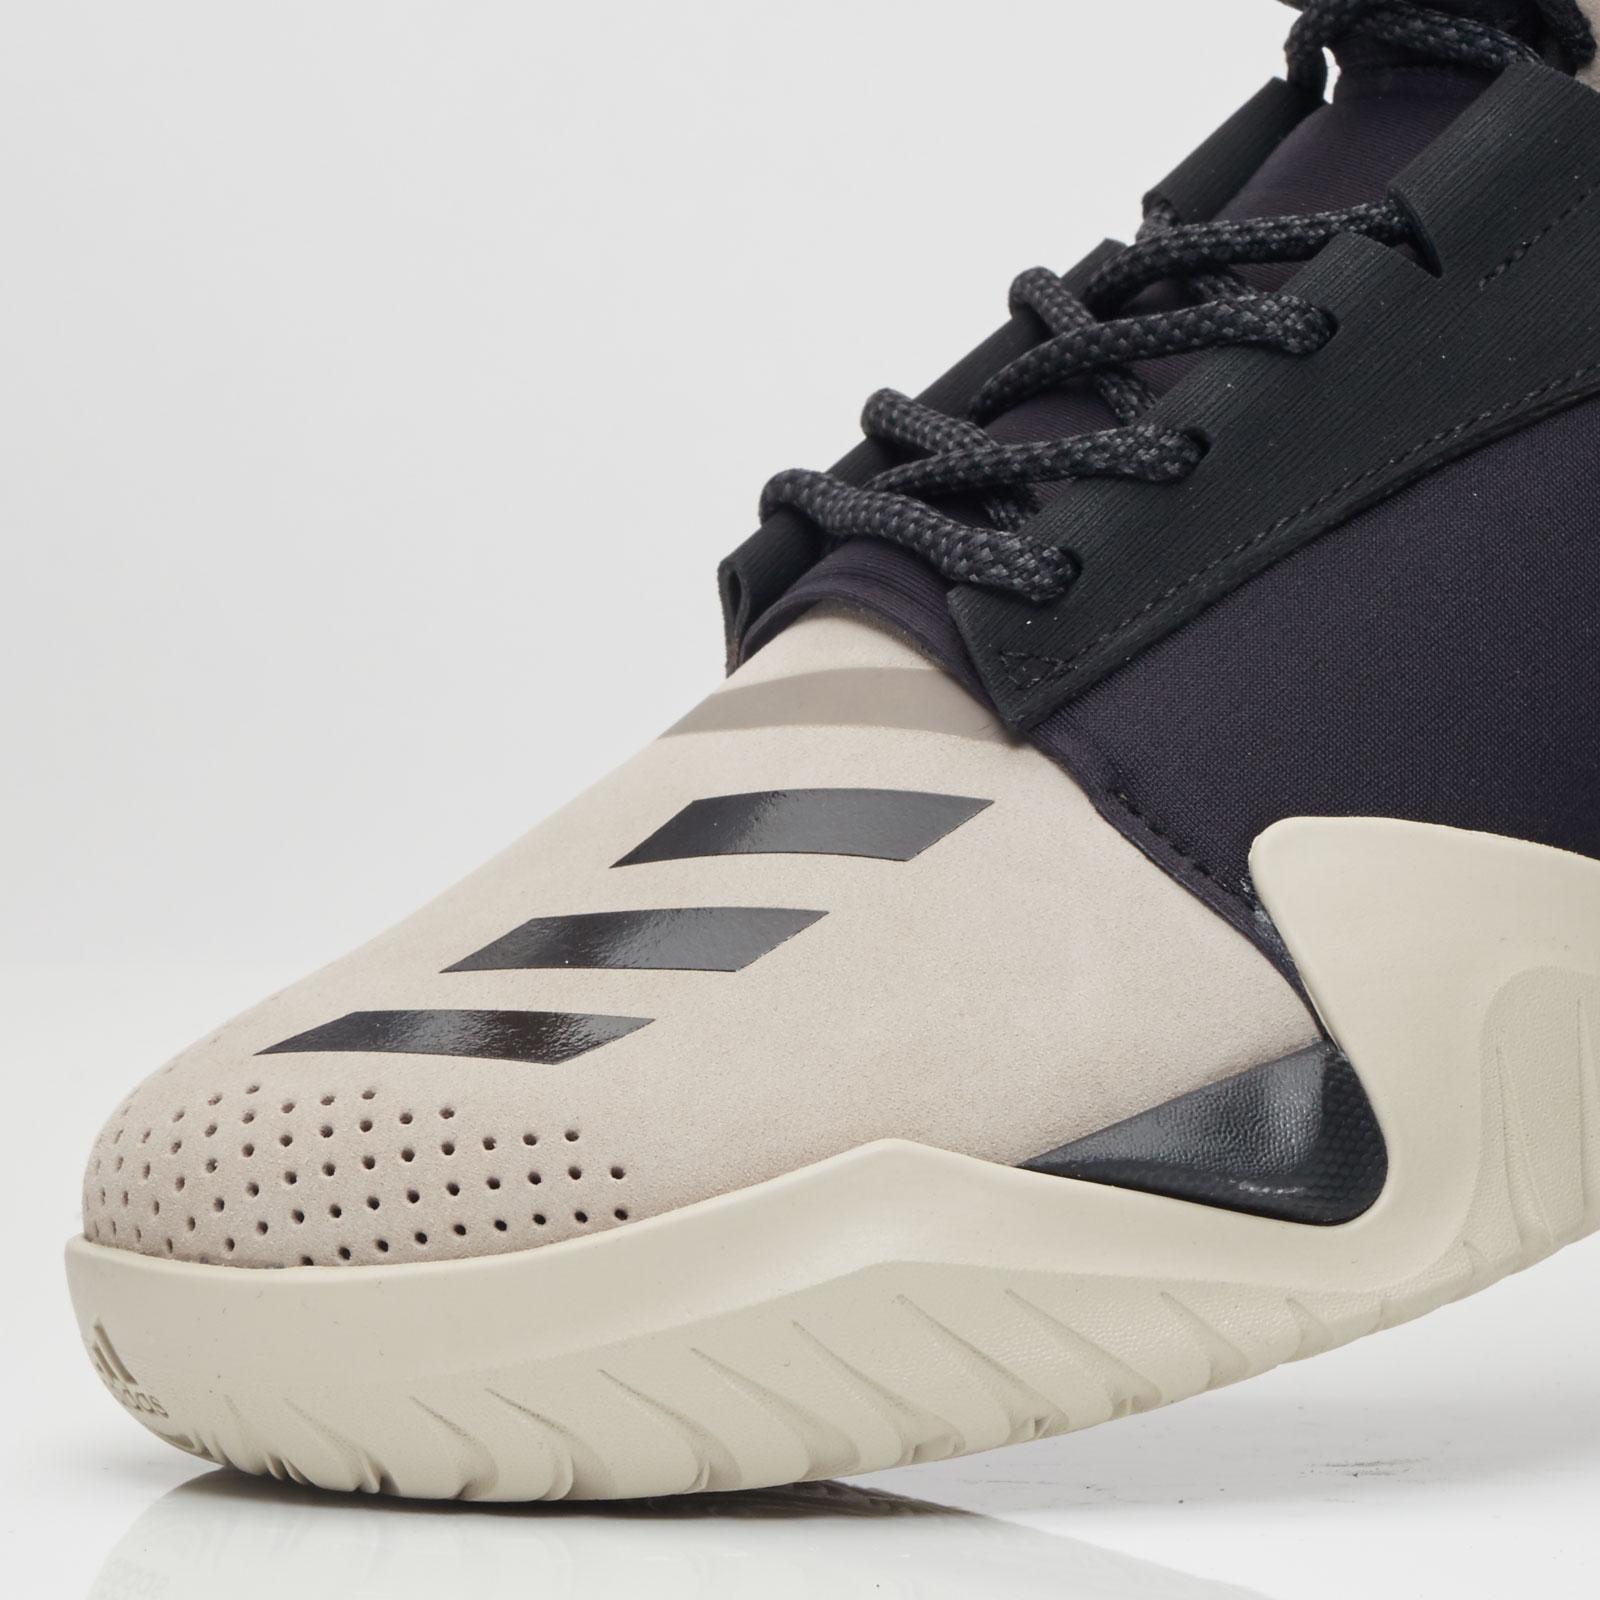 c9c88c8f9 adidas ADO Crazy Team - By2869 - Sneakersnstuff